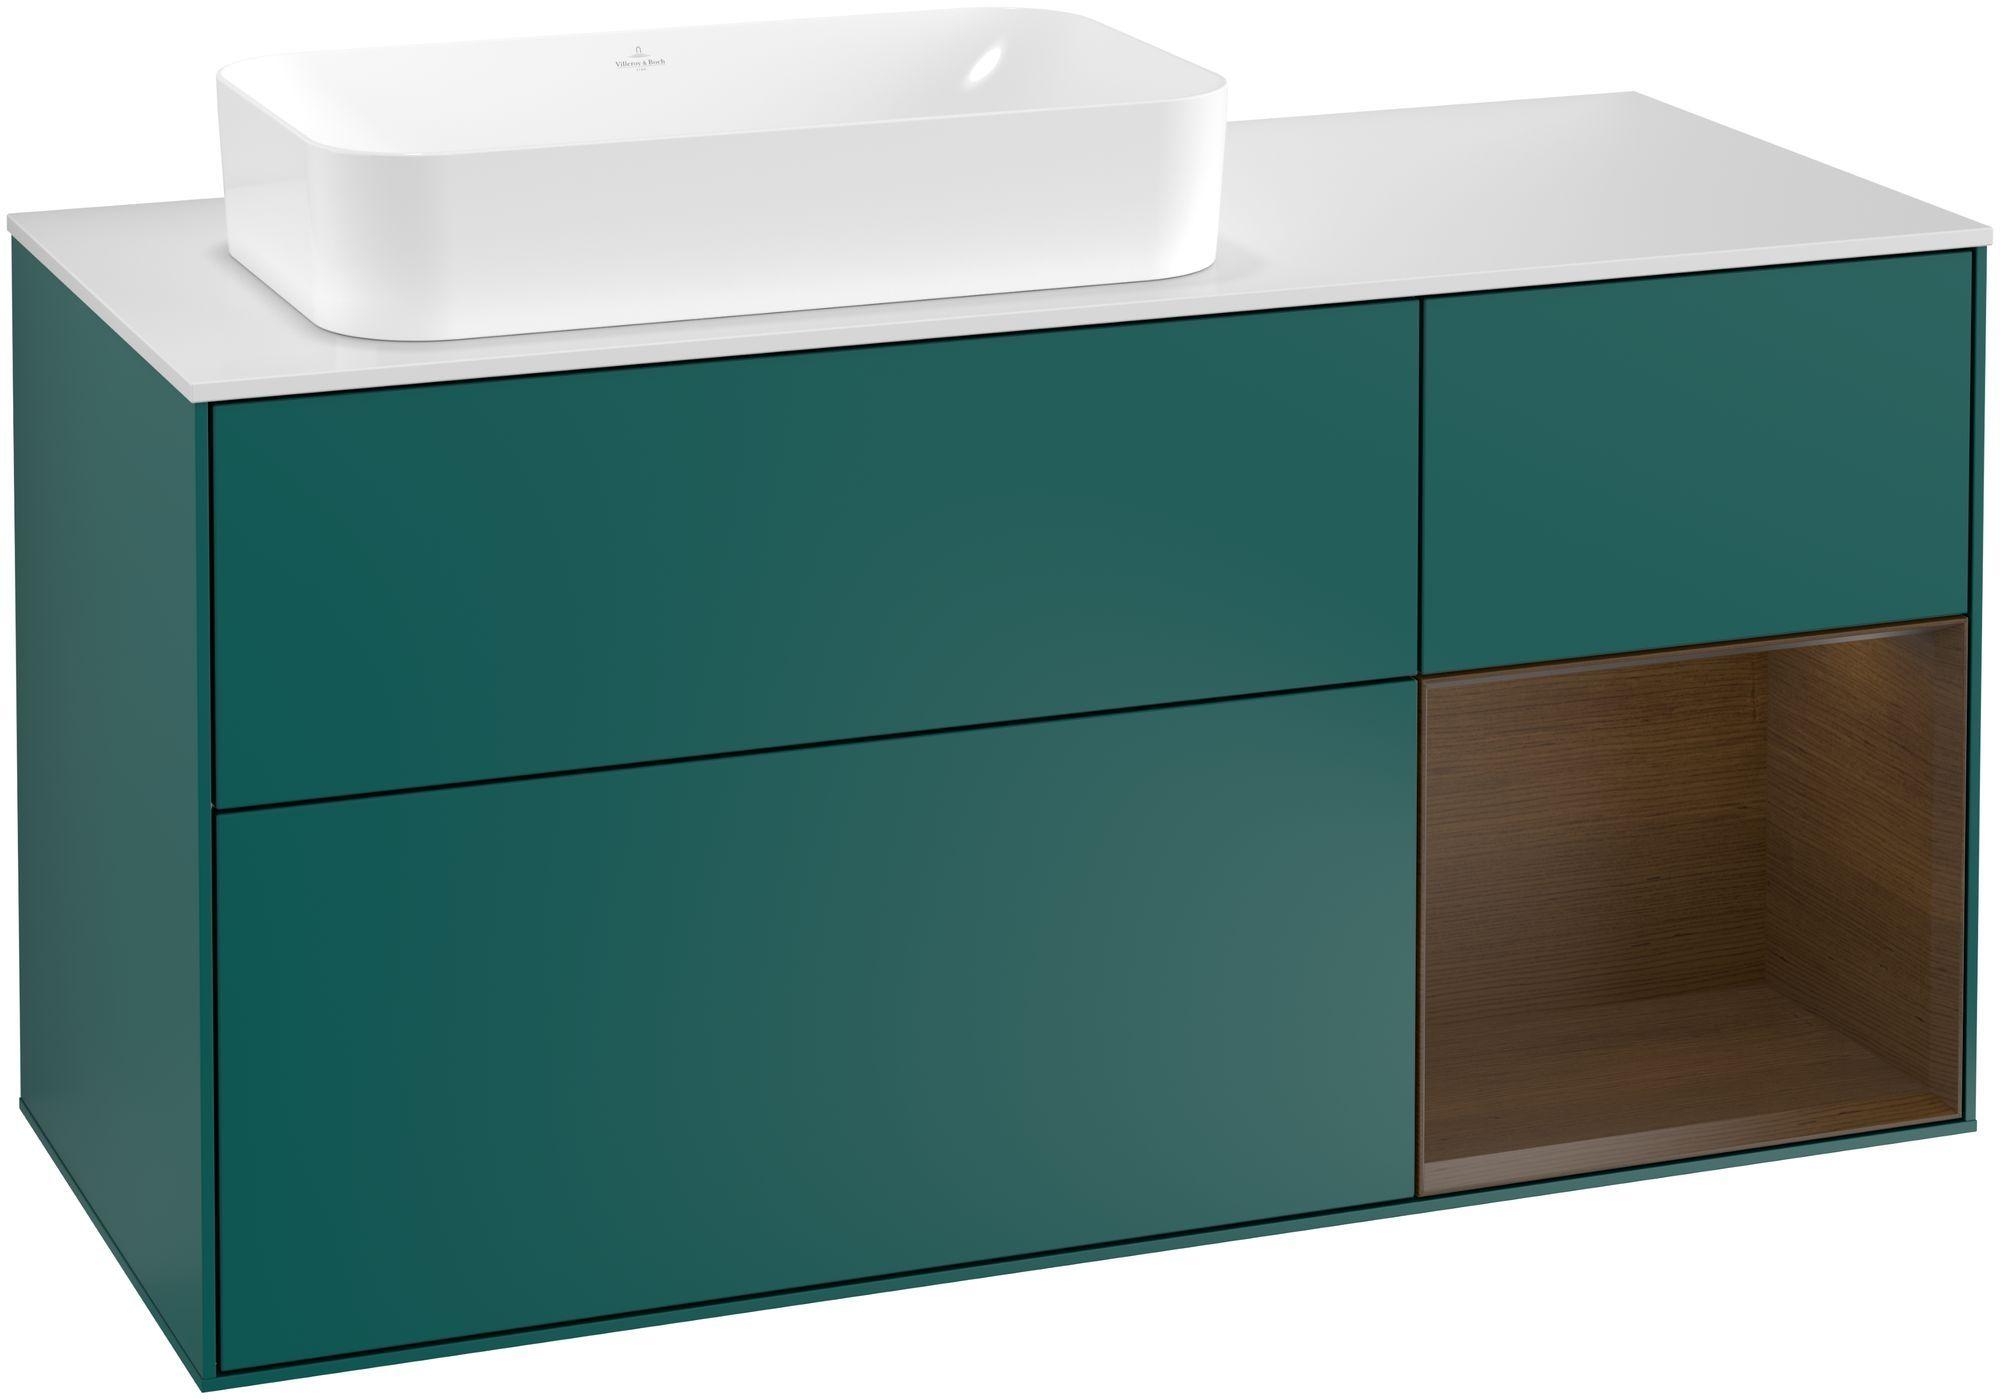 Villeroy & Boch Finion G28 Waschtischunterschrank mit Regalelement 3 Auszüge Waschtisch links LED-Beleuchtung B:120xH:60,3xT:50,1cm Front, Korpus: Cedar, Regal: Walnut Veneer, Glasplatte: White Matt G281GNGS